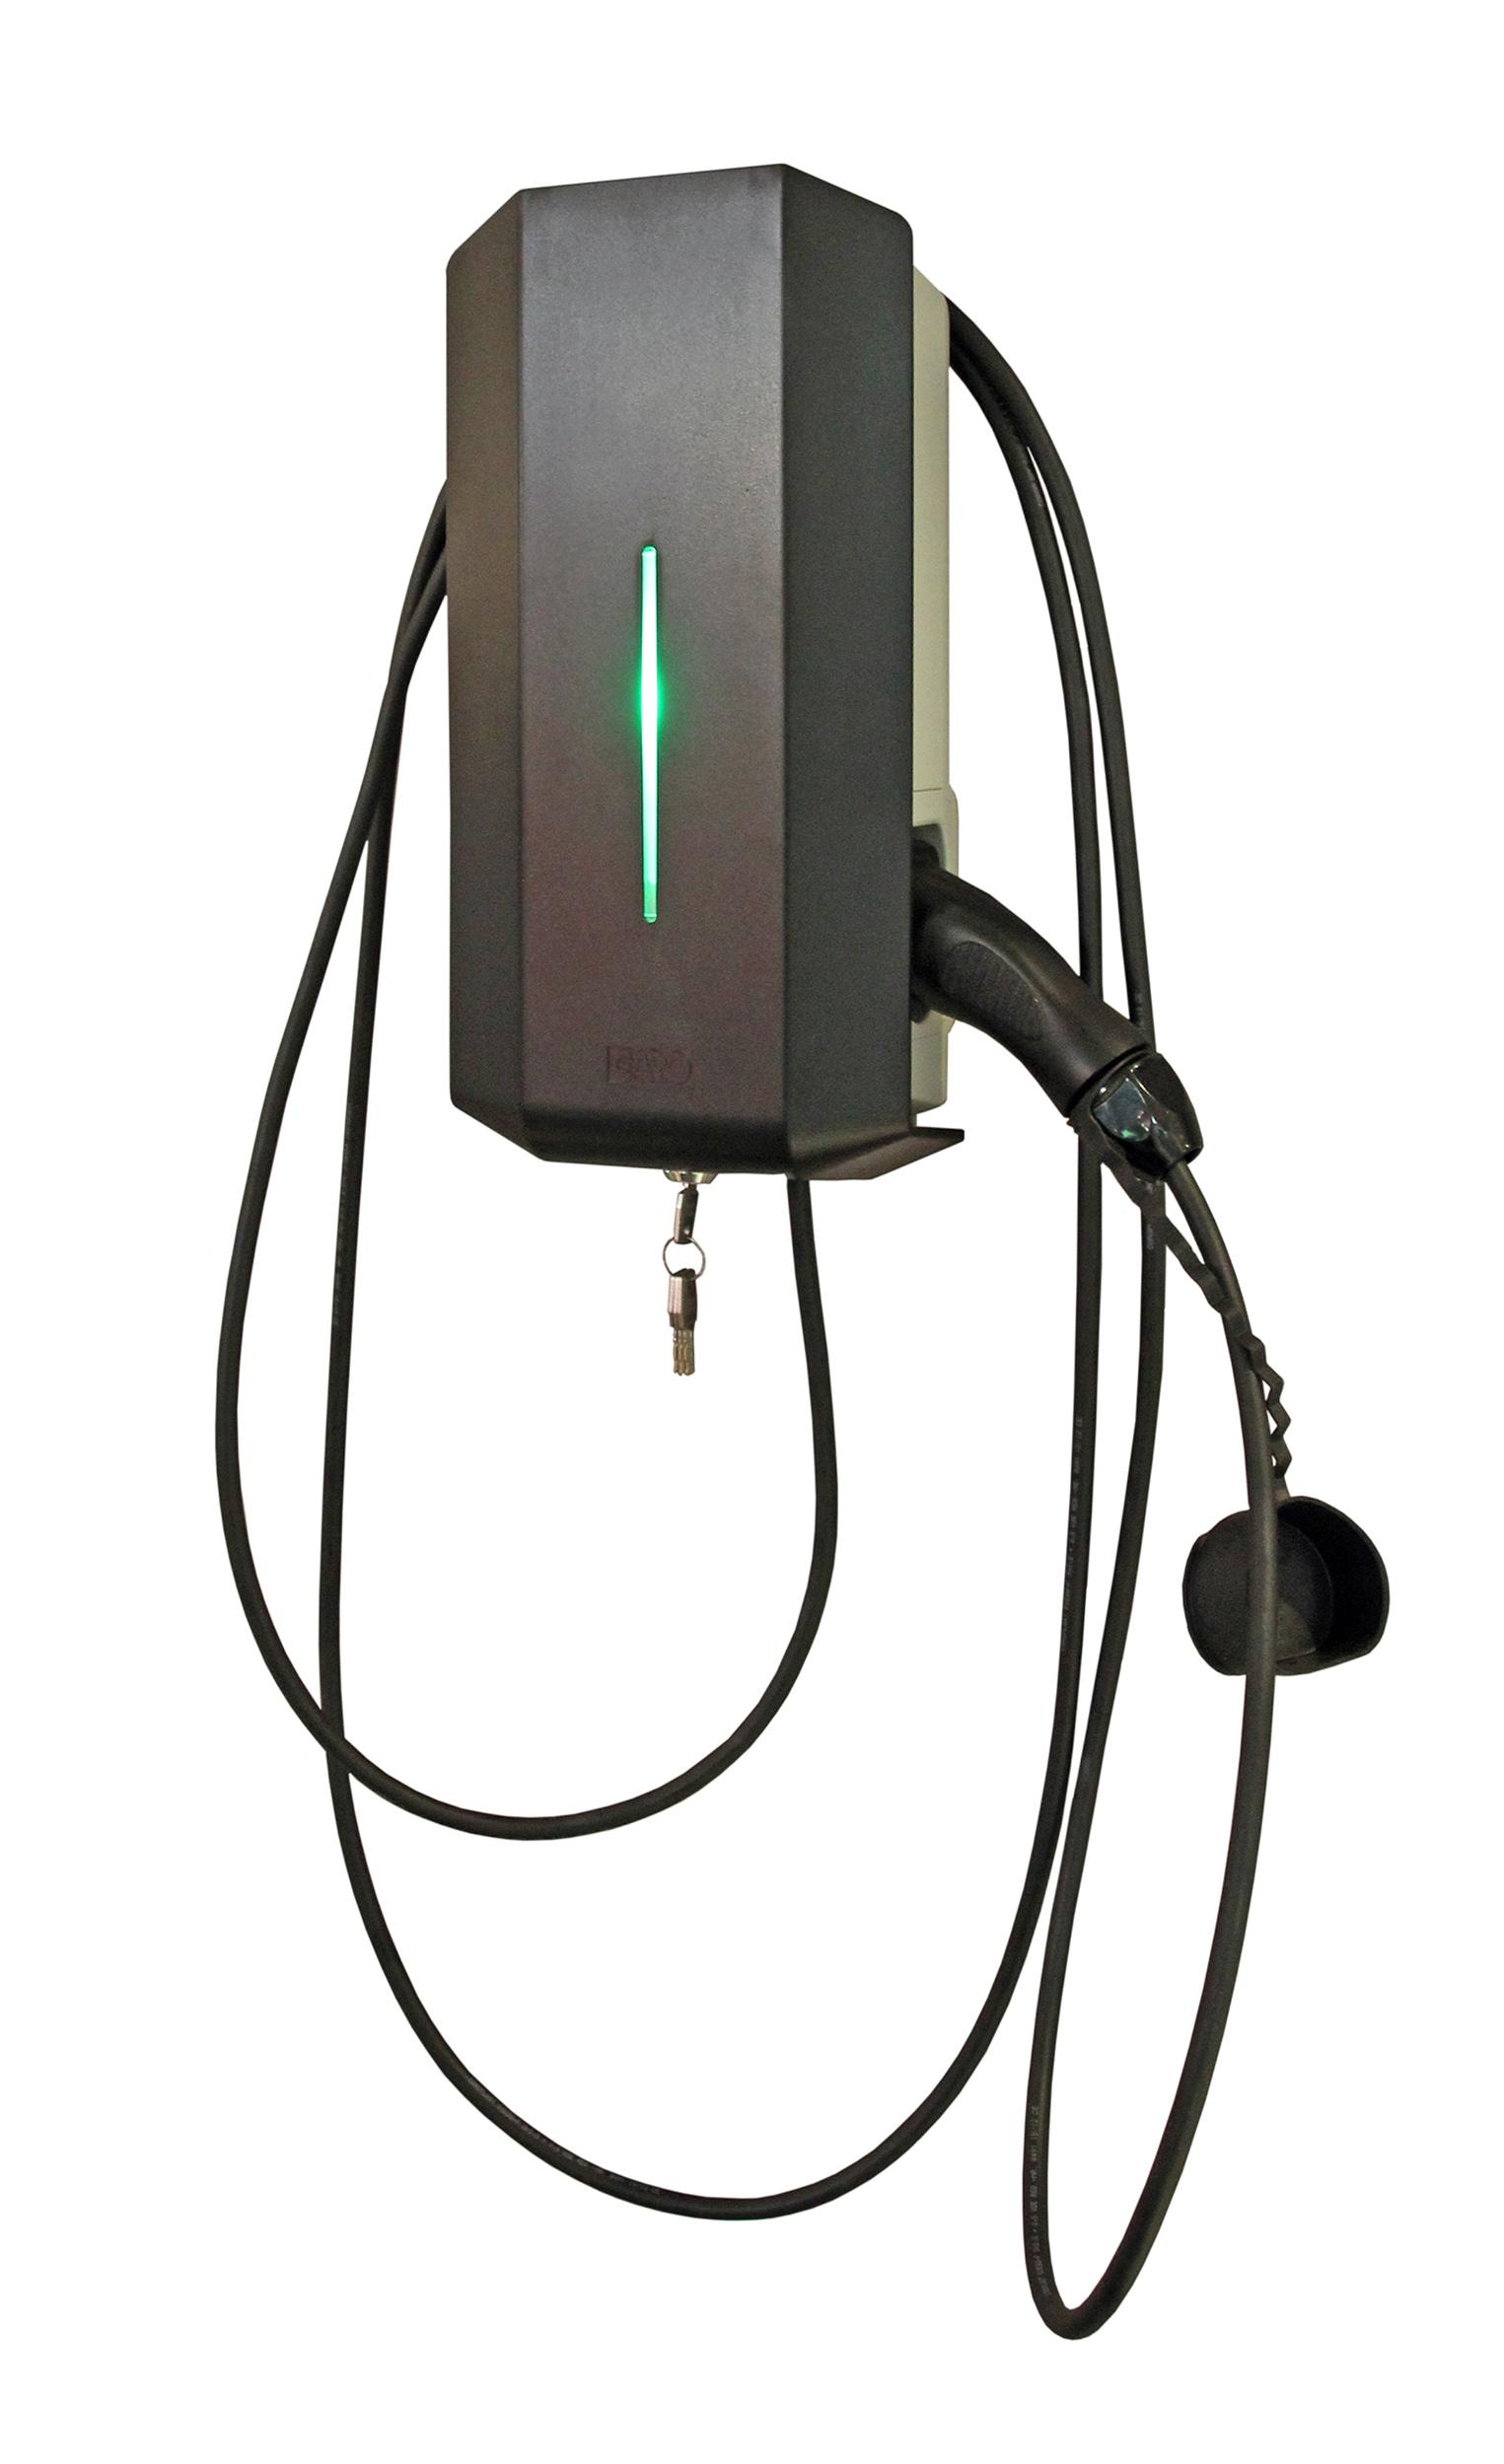 GLB 3,7 kW fast kabel Typ 2